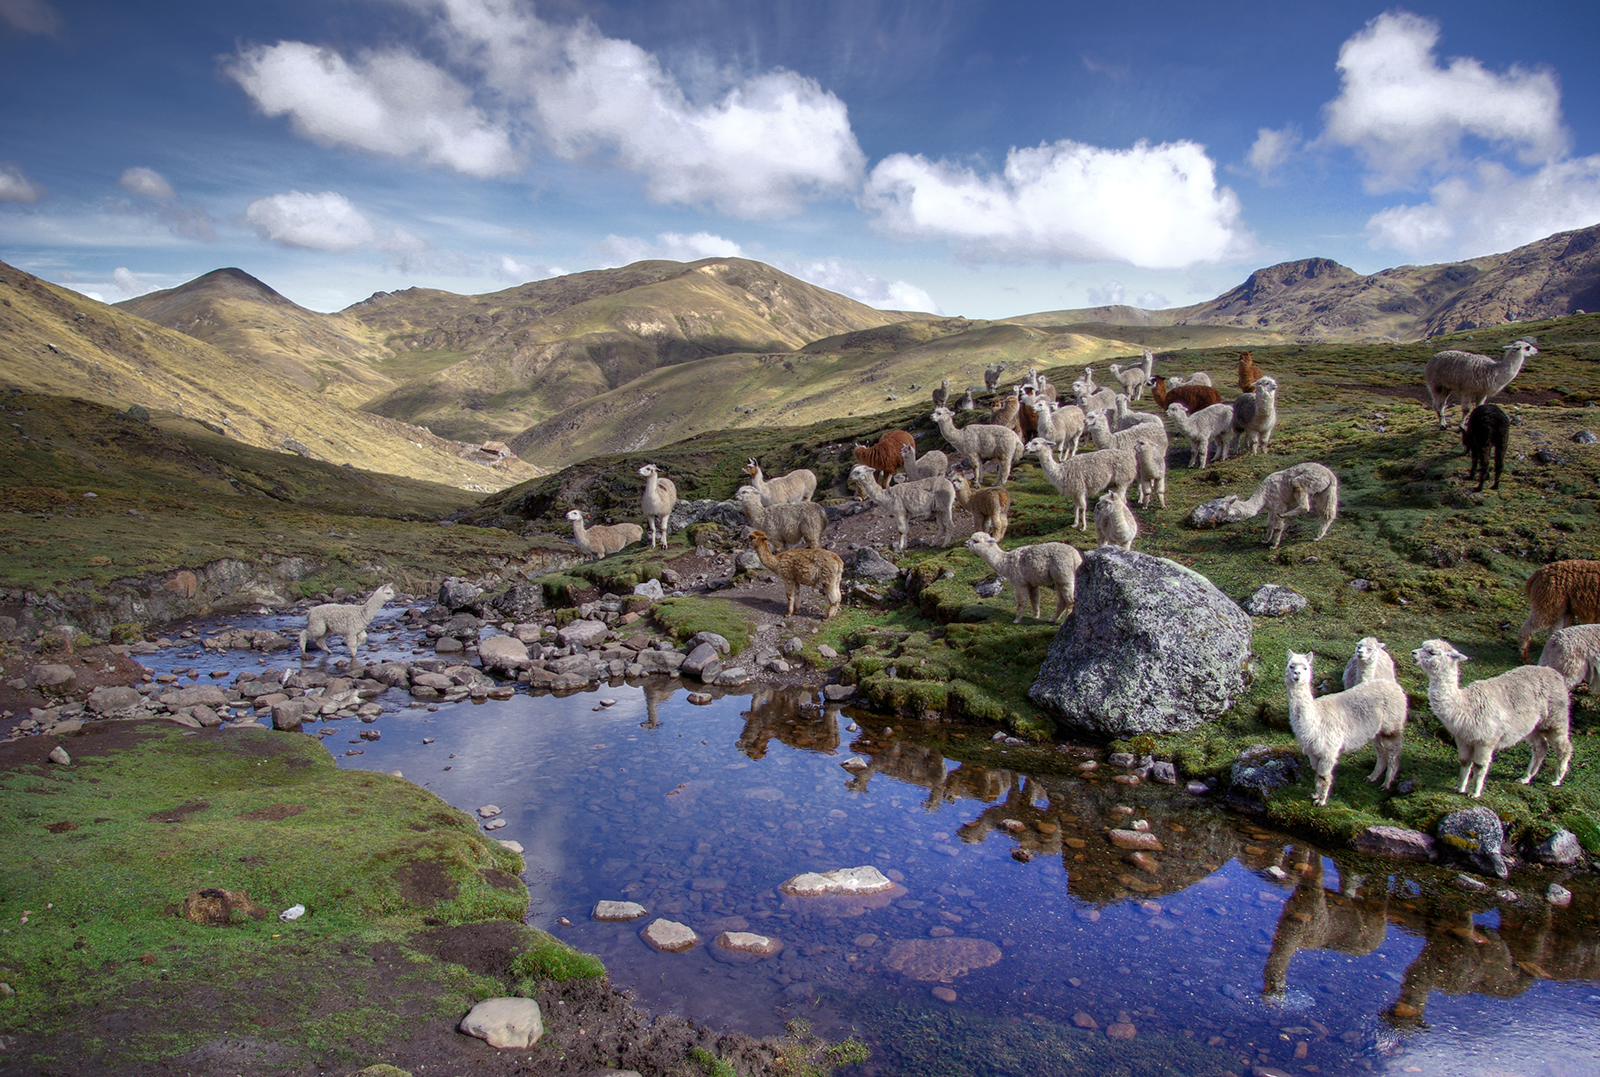 Llamas and Alpacas in the Andes